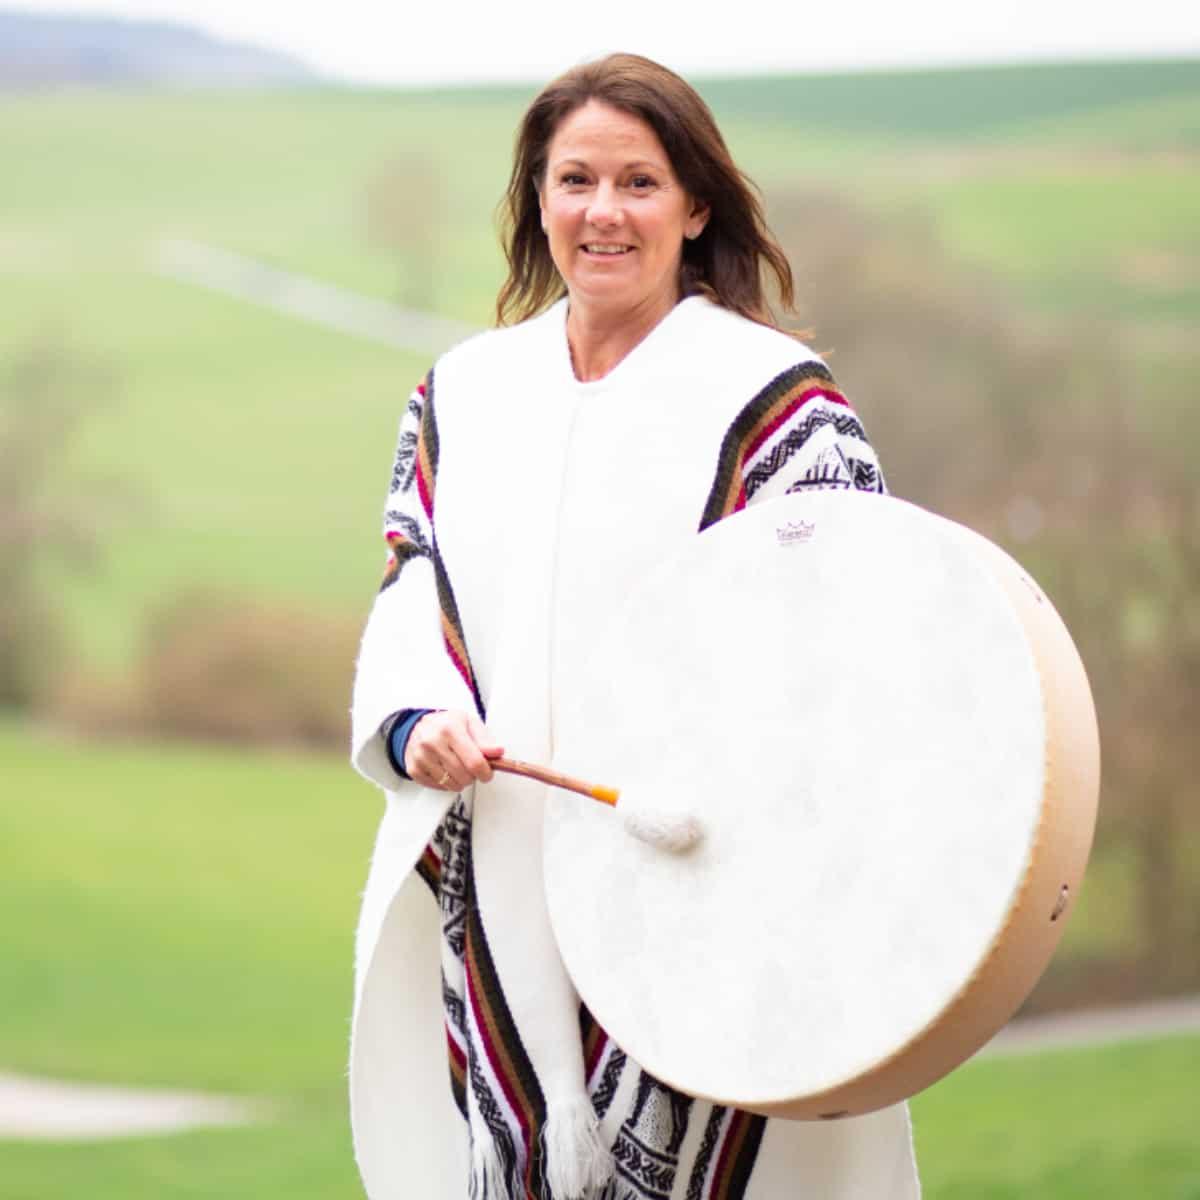 Carina El-Nomany - schamanisches Ritual Outdoor